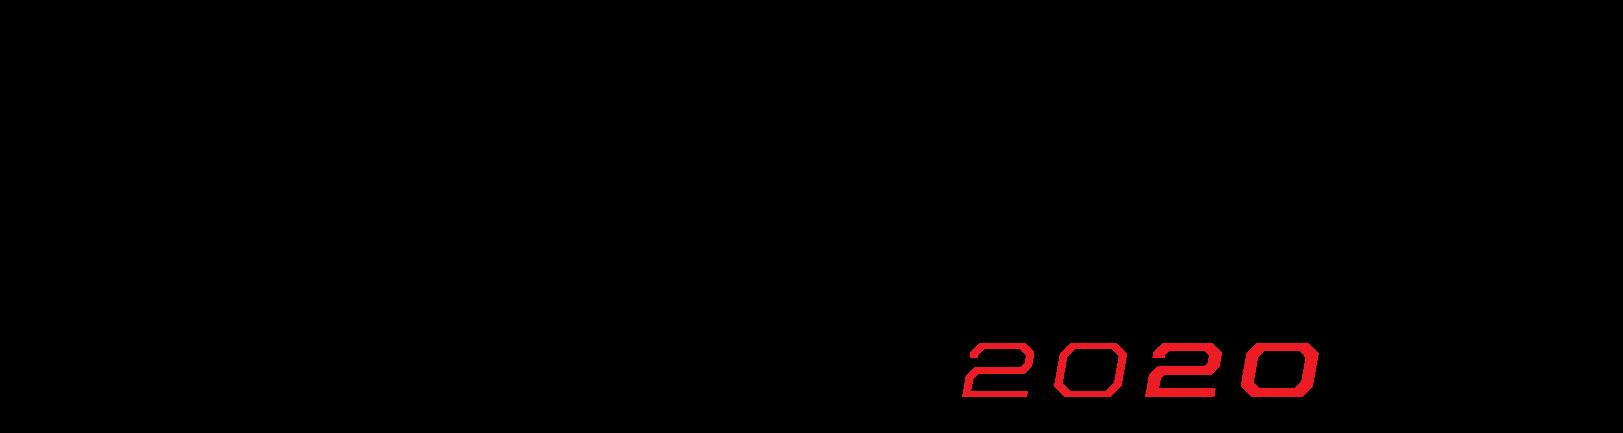 Dev.Play 2020